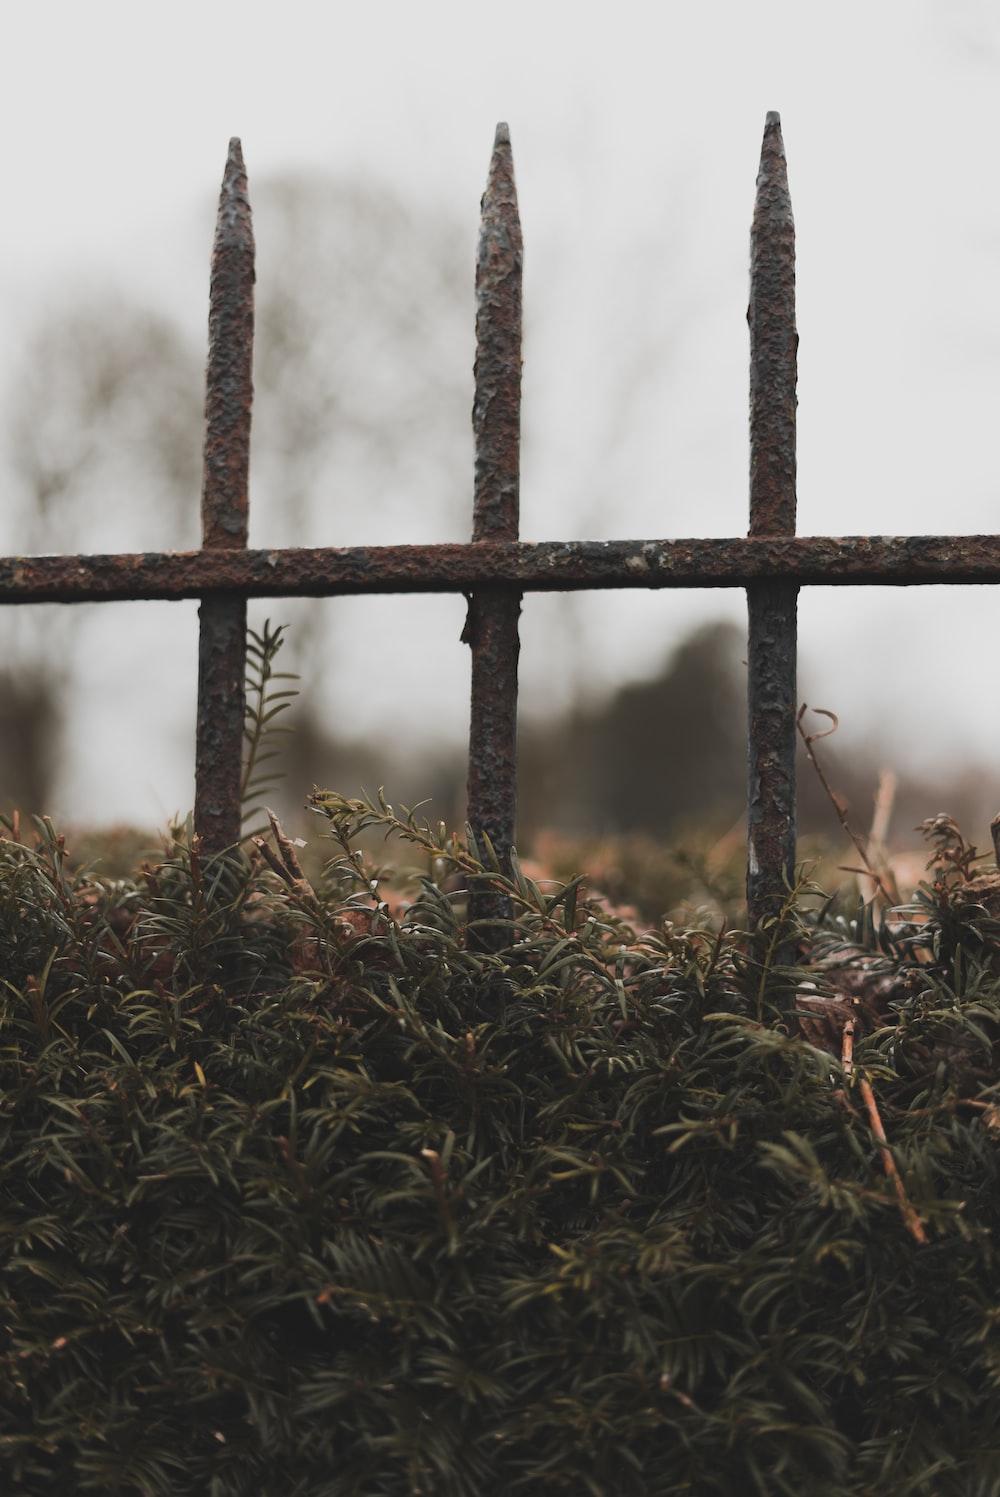 brown grass field near black metal fence